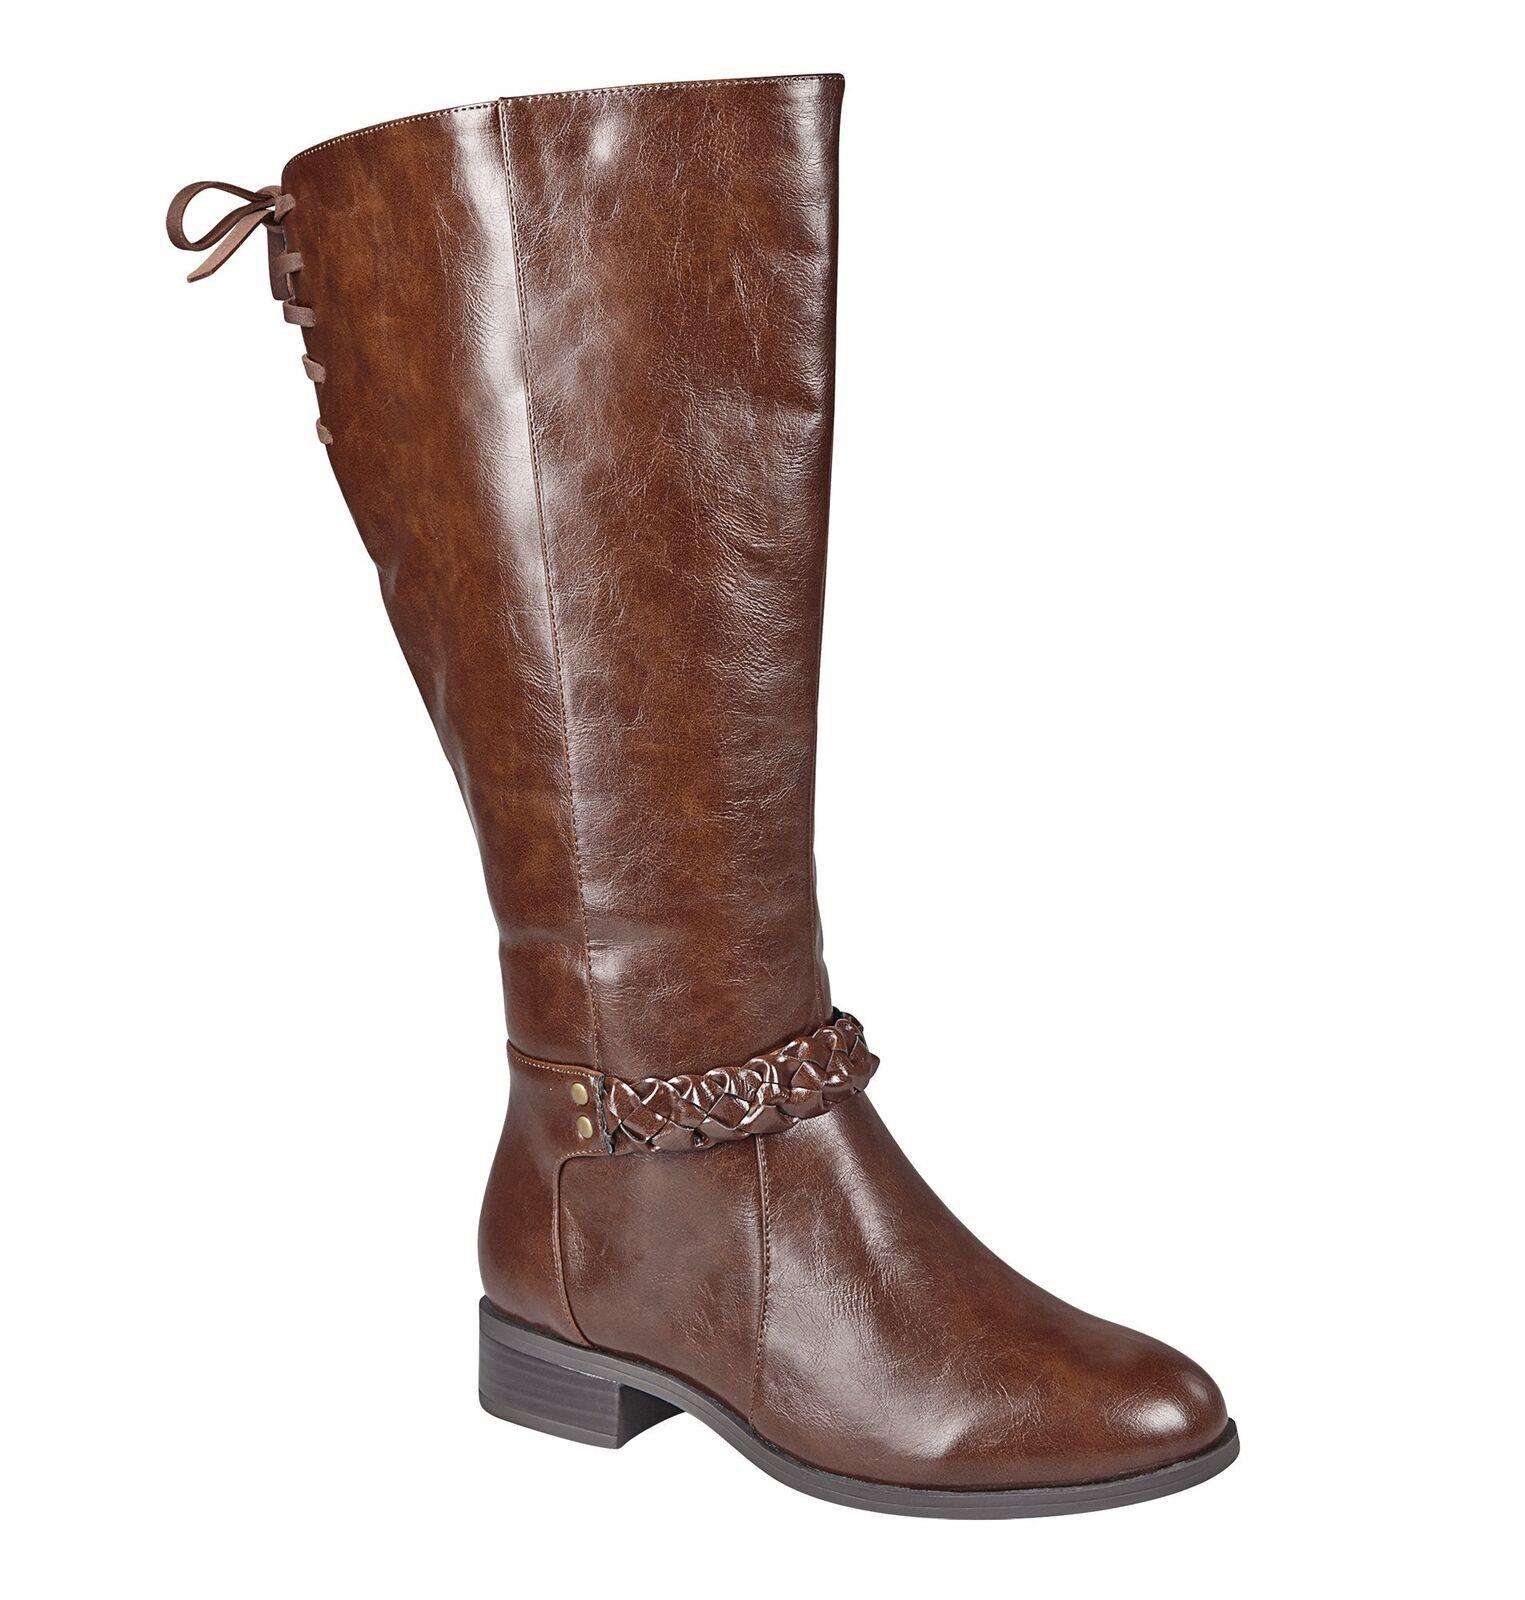 Avenue Women's Kara Braided Riding Boot Cognac 8 W US